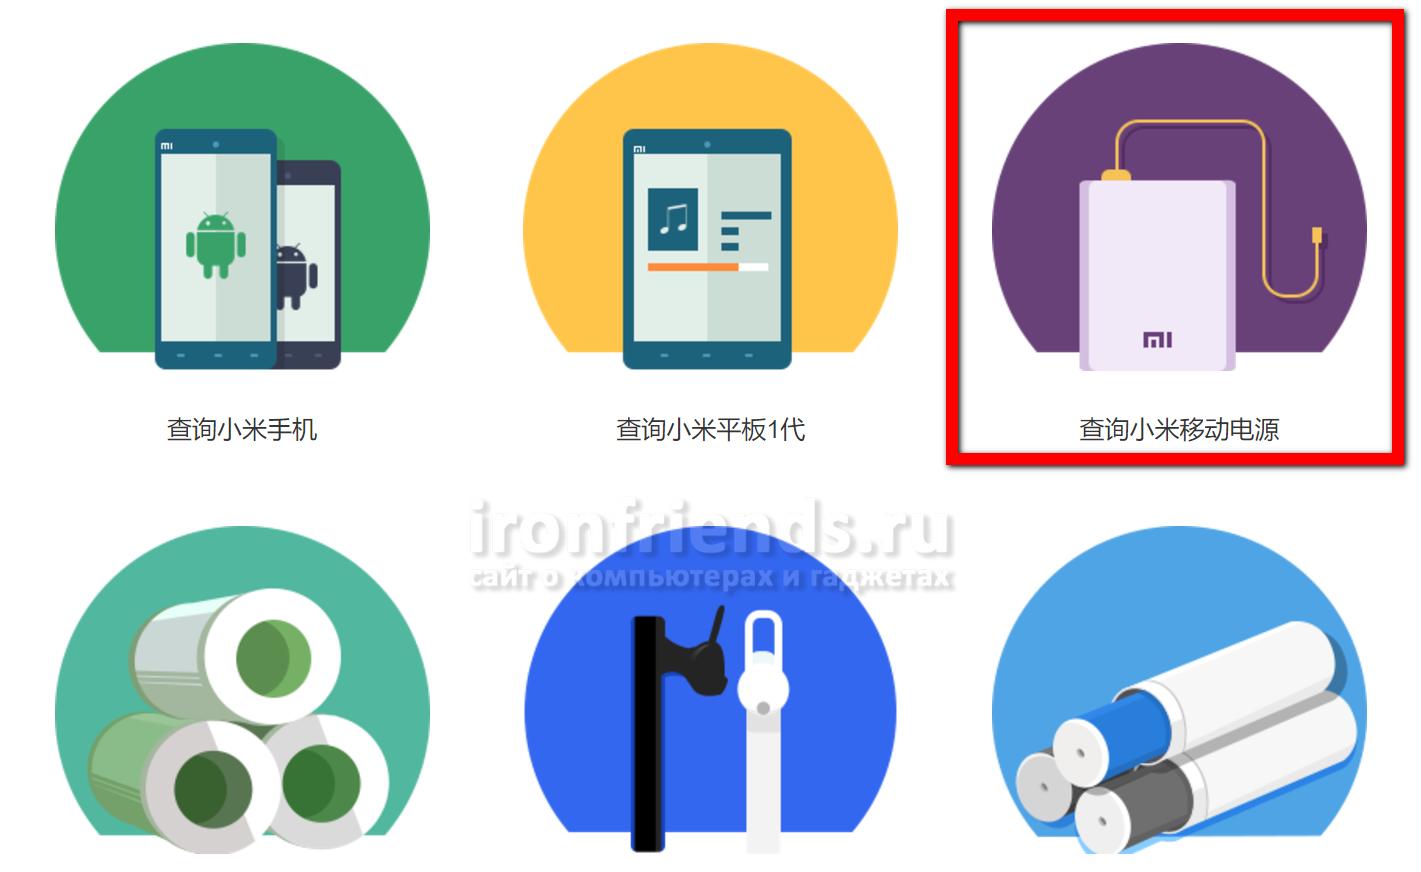 Проверка подлинности Xiaomi Power Bank 20000